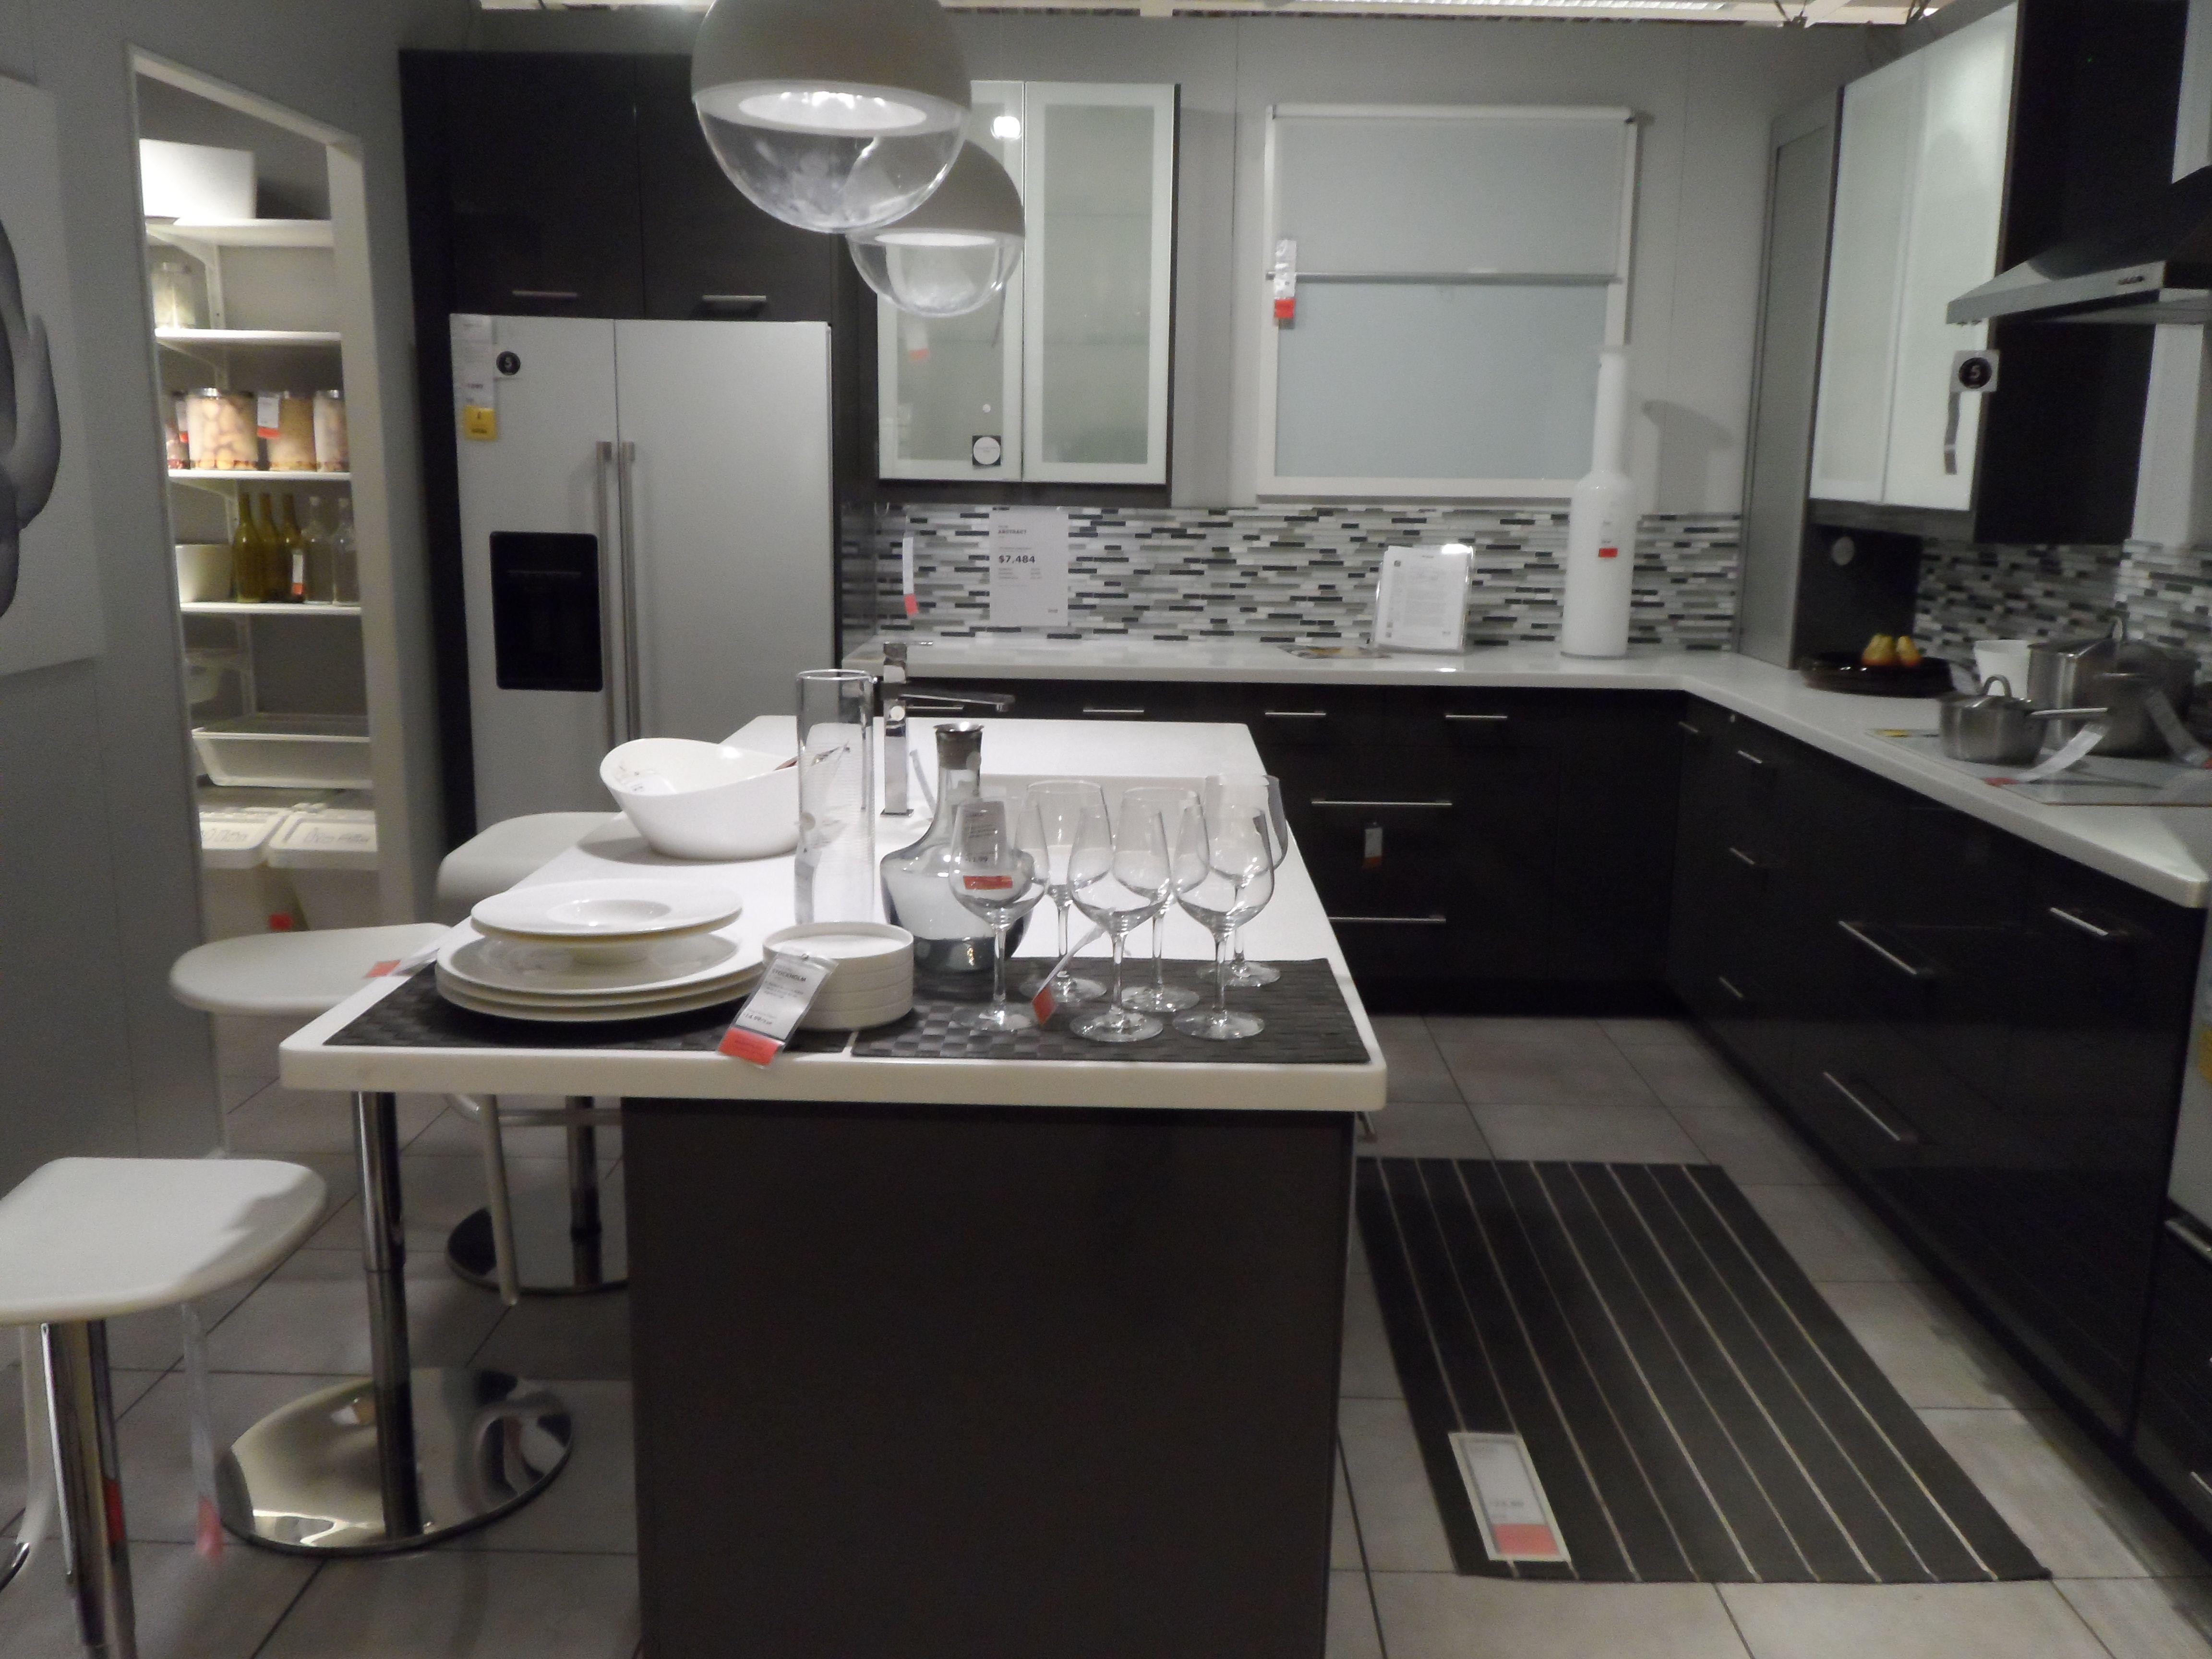 Ikea bathroom showroom 28 images 26 best kitchen for Ikea showroom near me